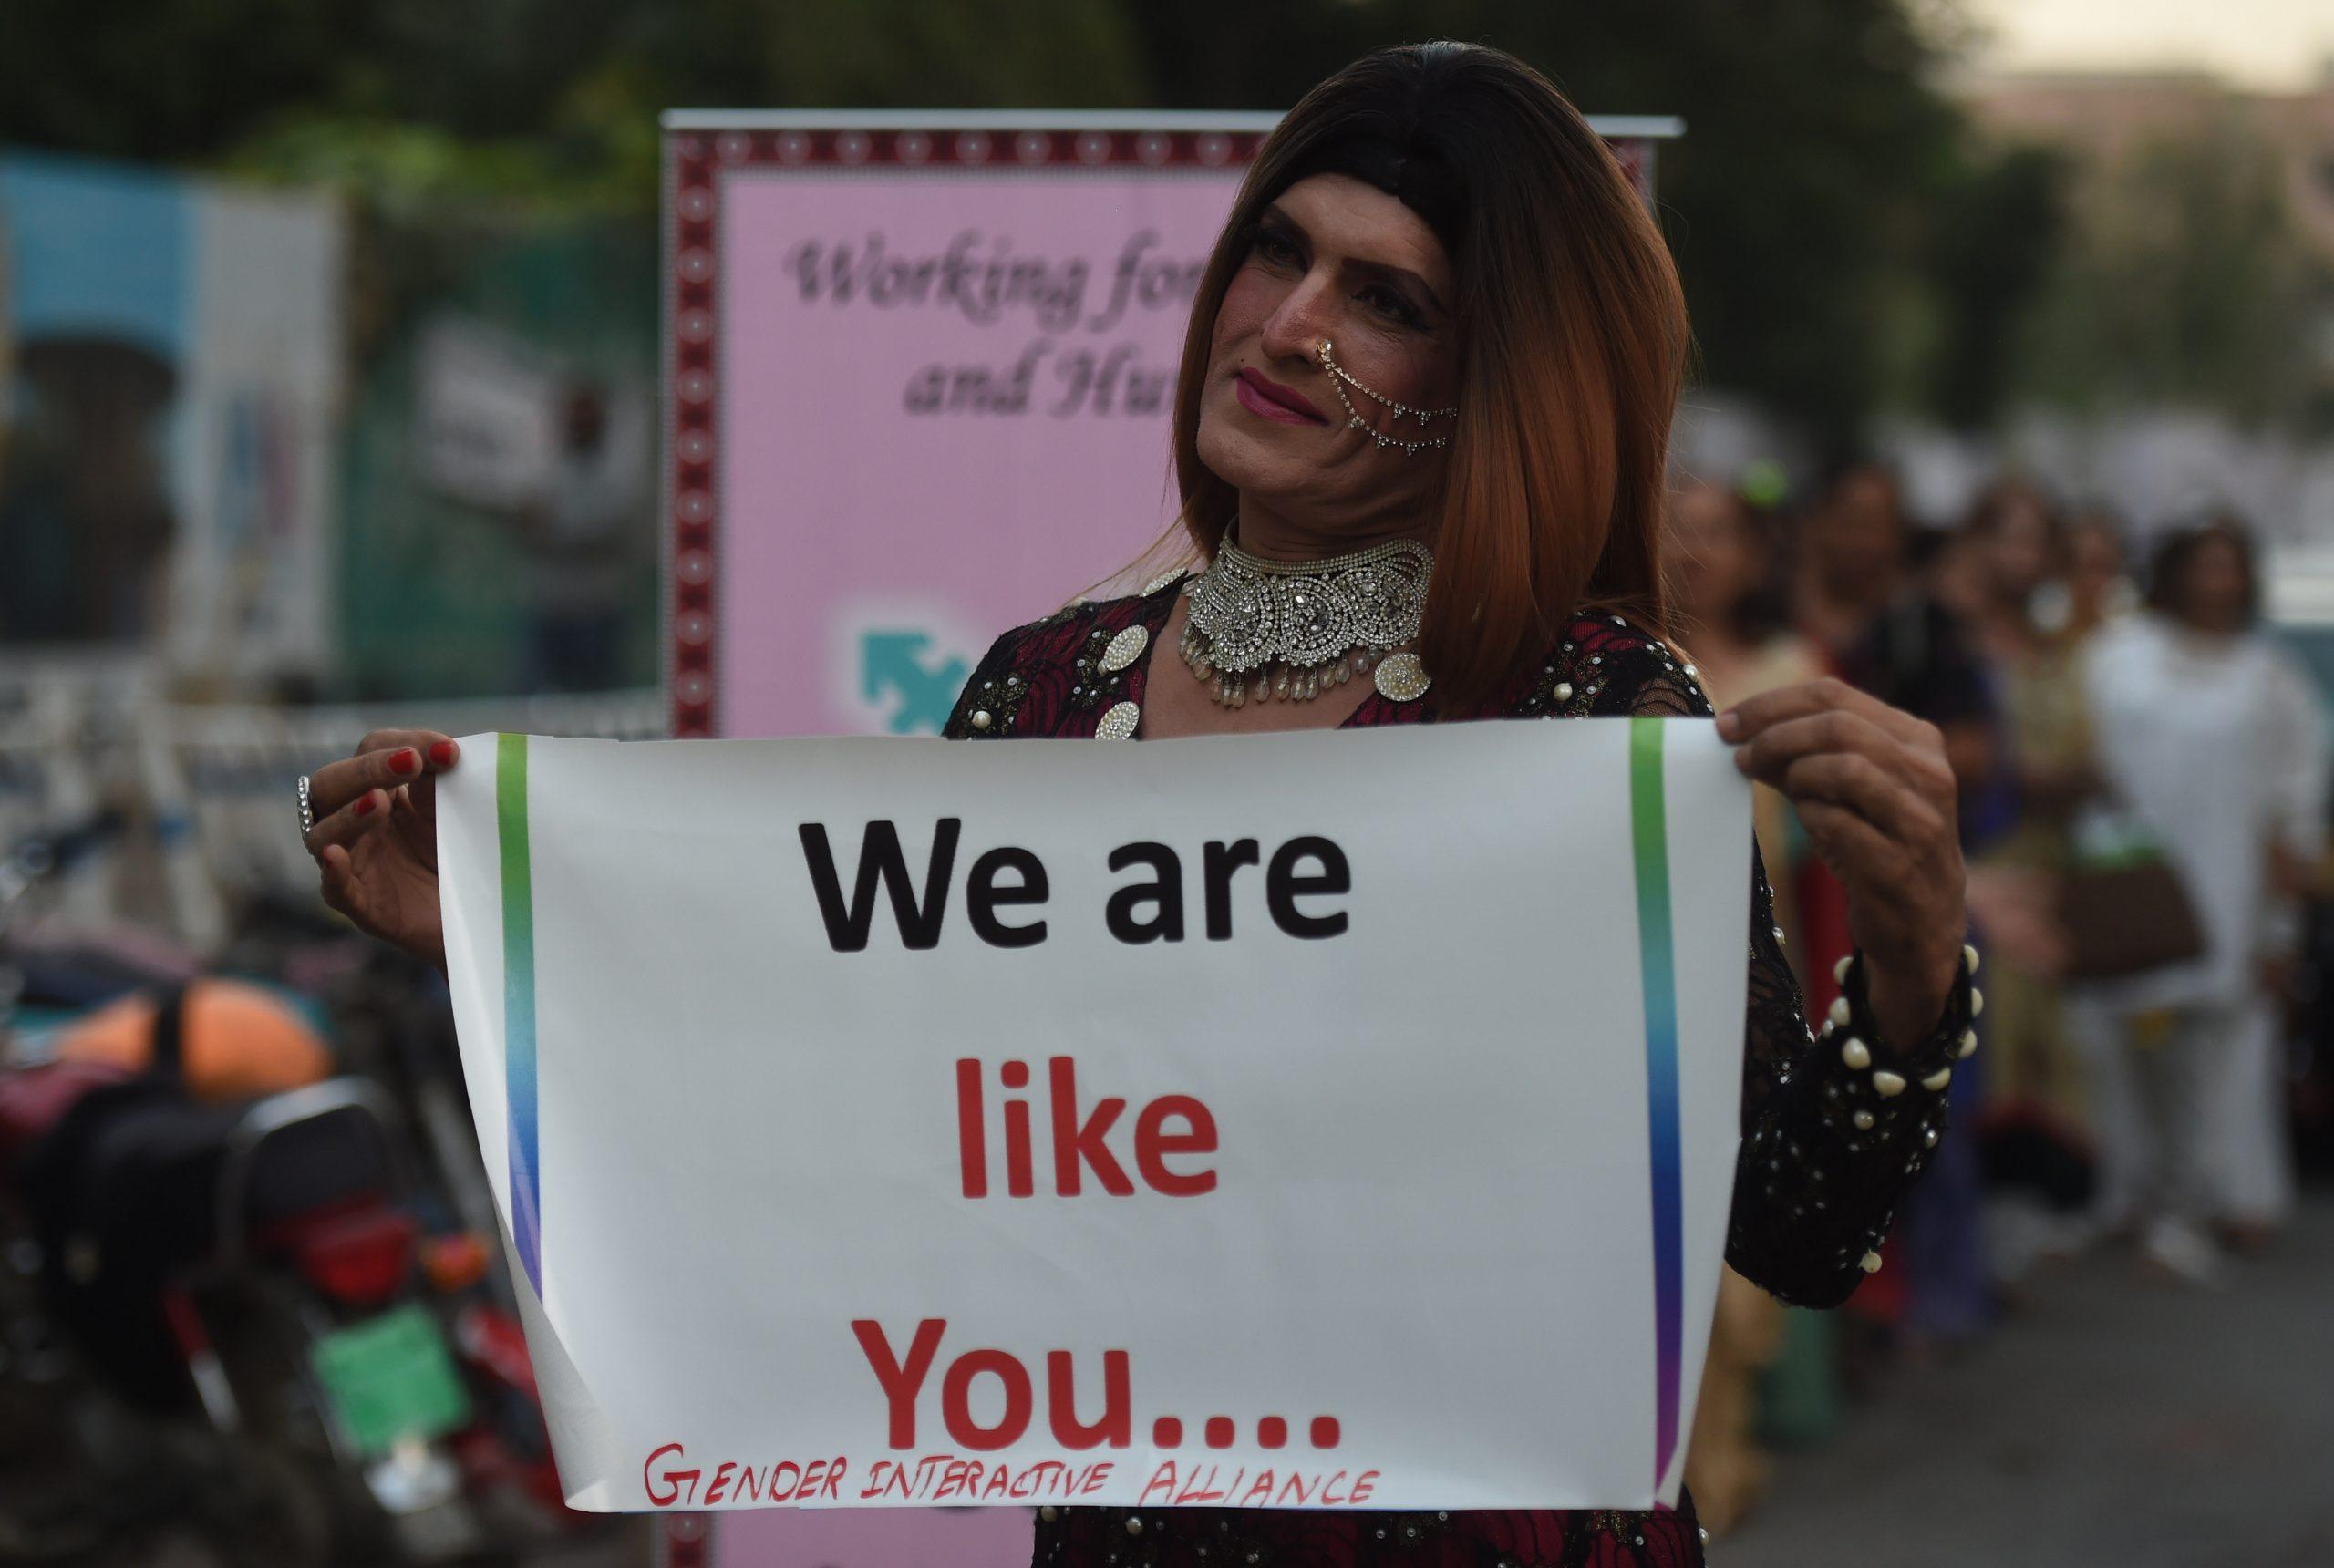 Initiative Pakistan Government for Transgender Community